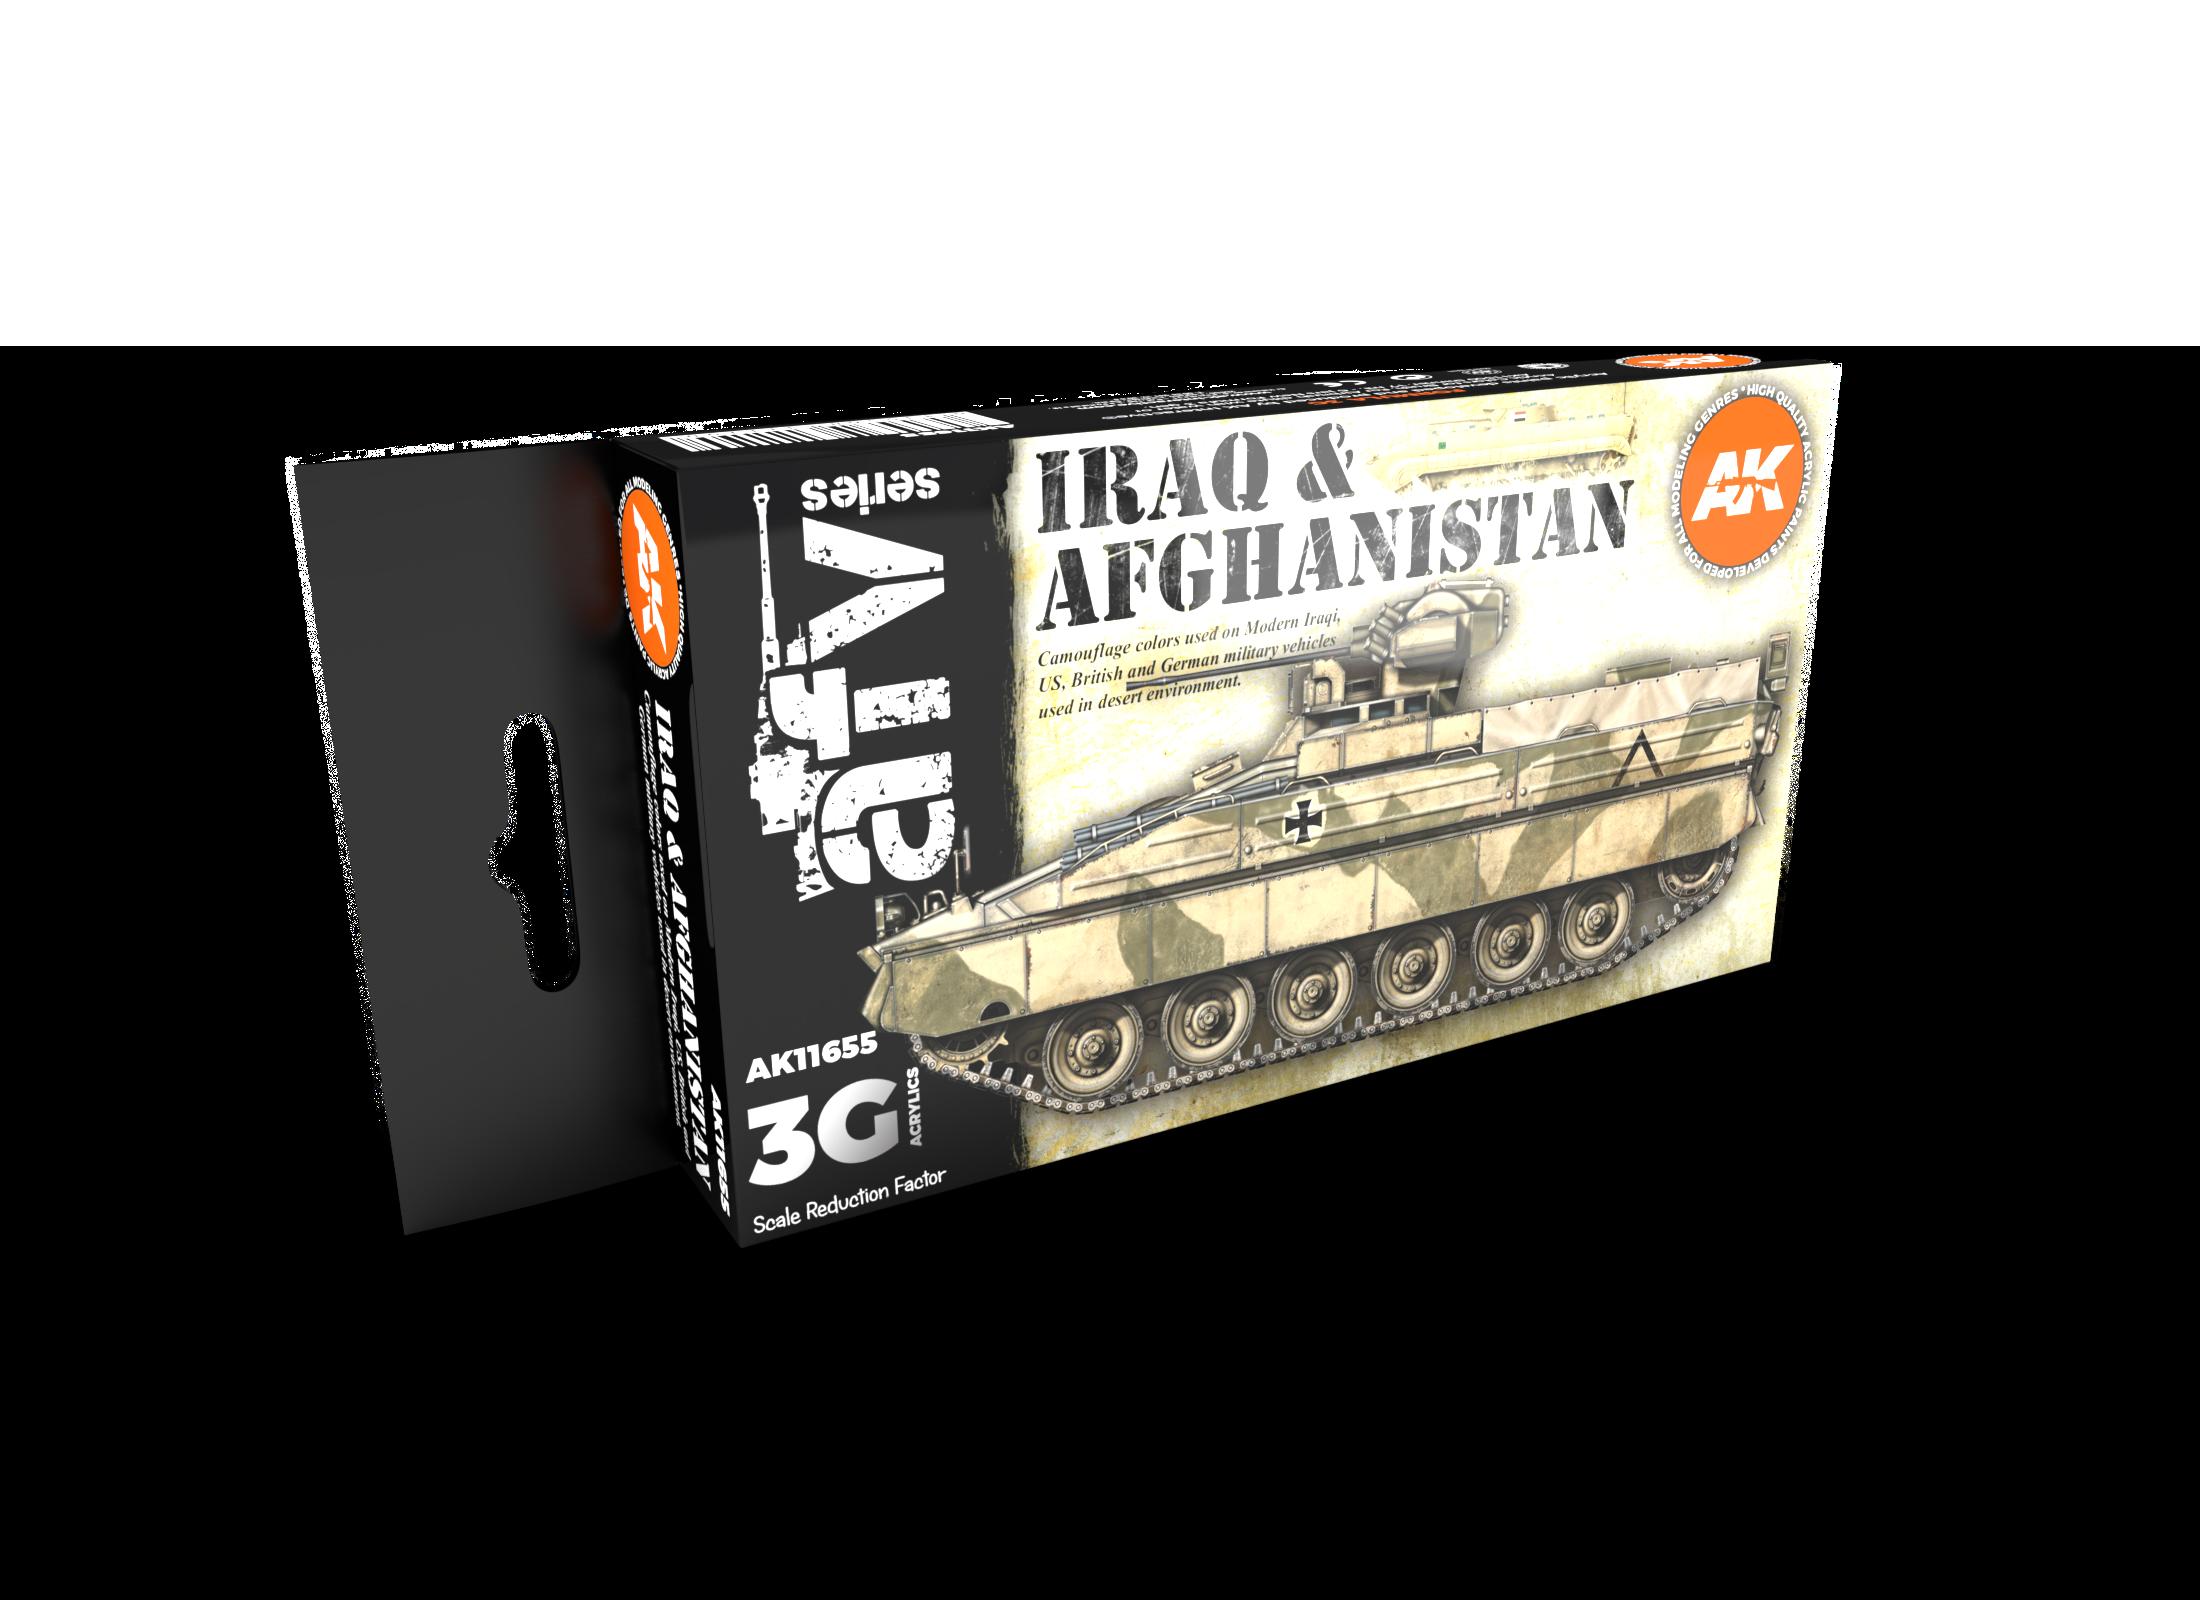 AK Interactive 3G Iraq & Afghanistan